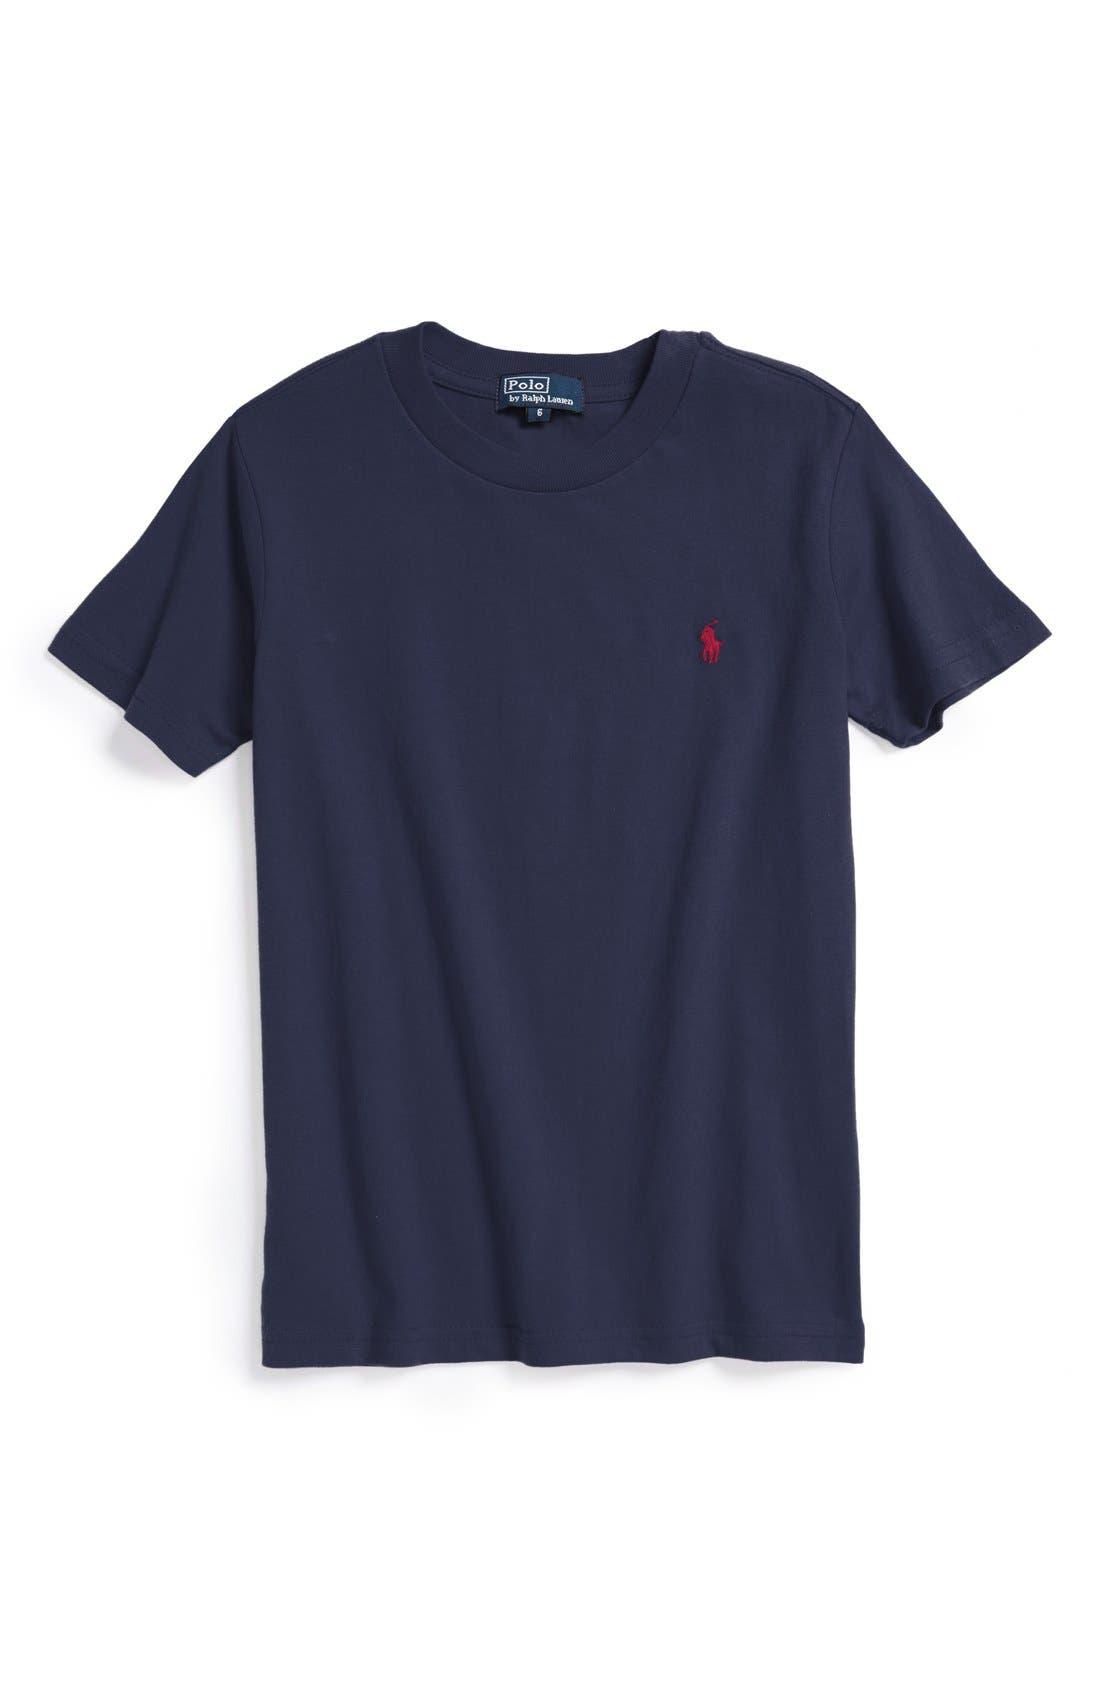 Alternate Image 1 Selected - Ralph Lauren Cotton Crewneck T-Shirt (Little Boys)